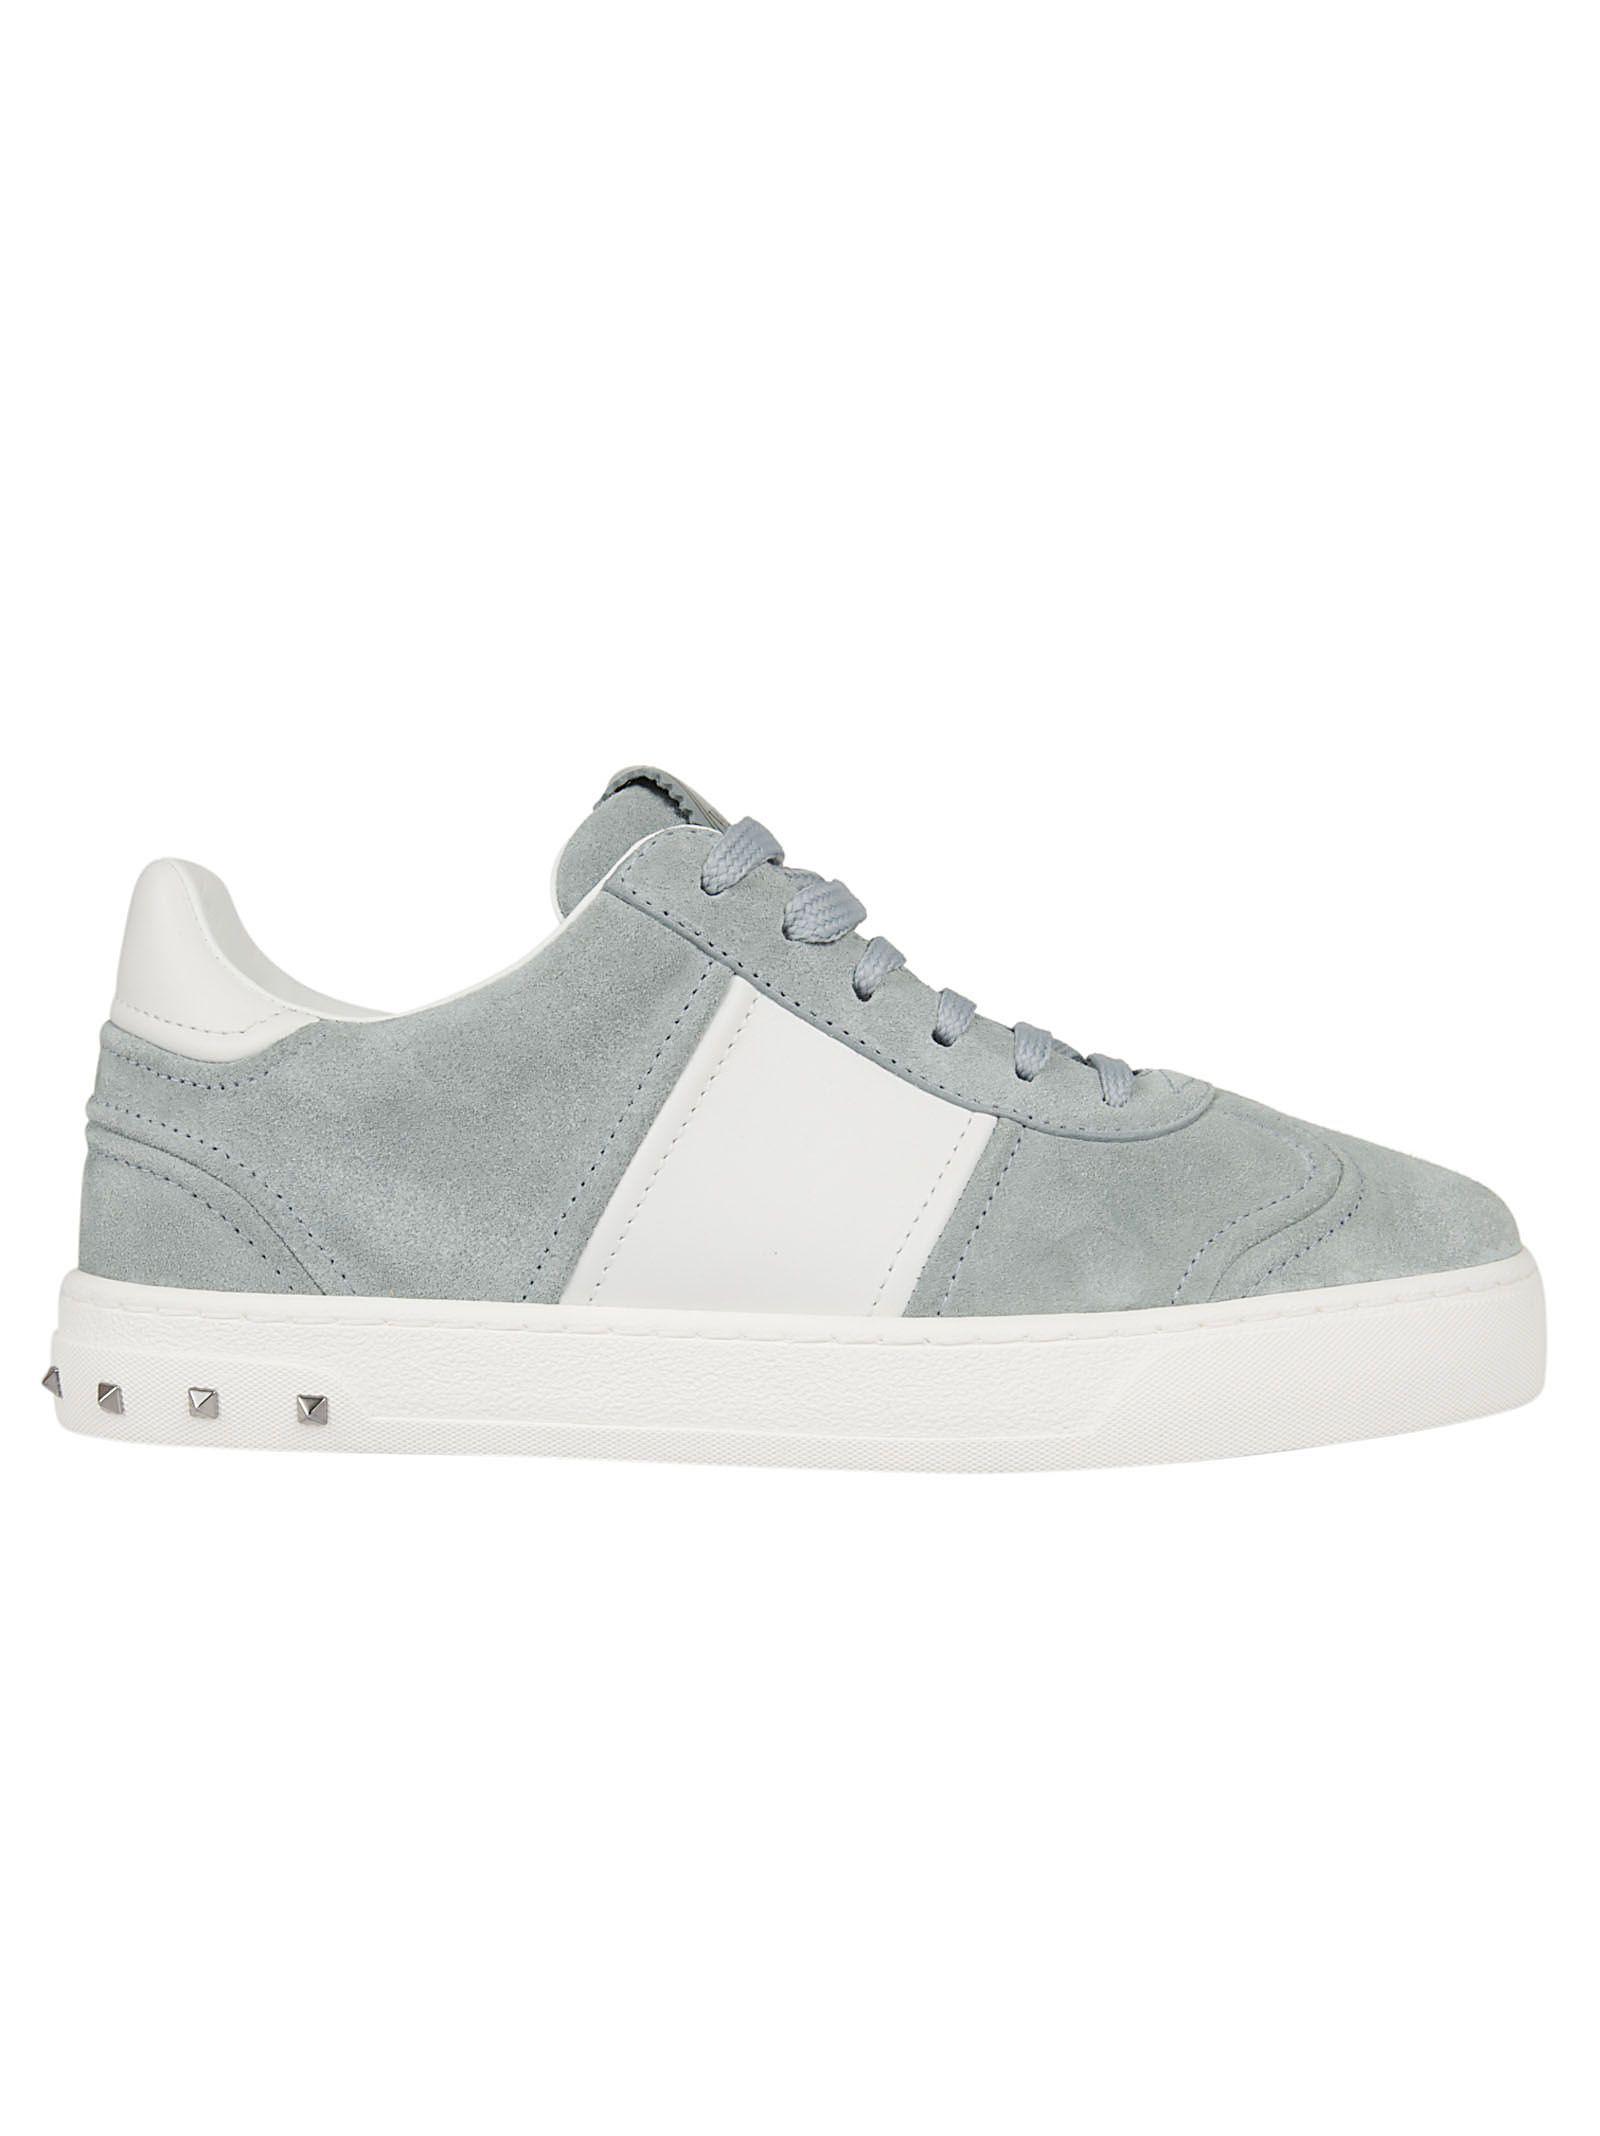 Flycrew sneakers - Grey Valentino v4LJll2W